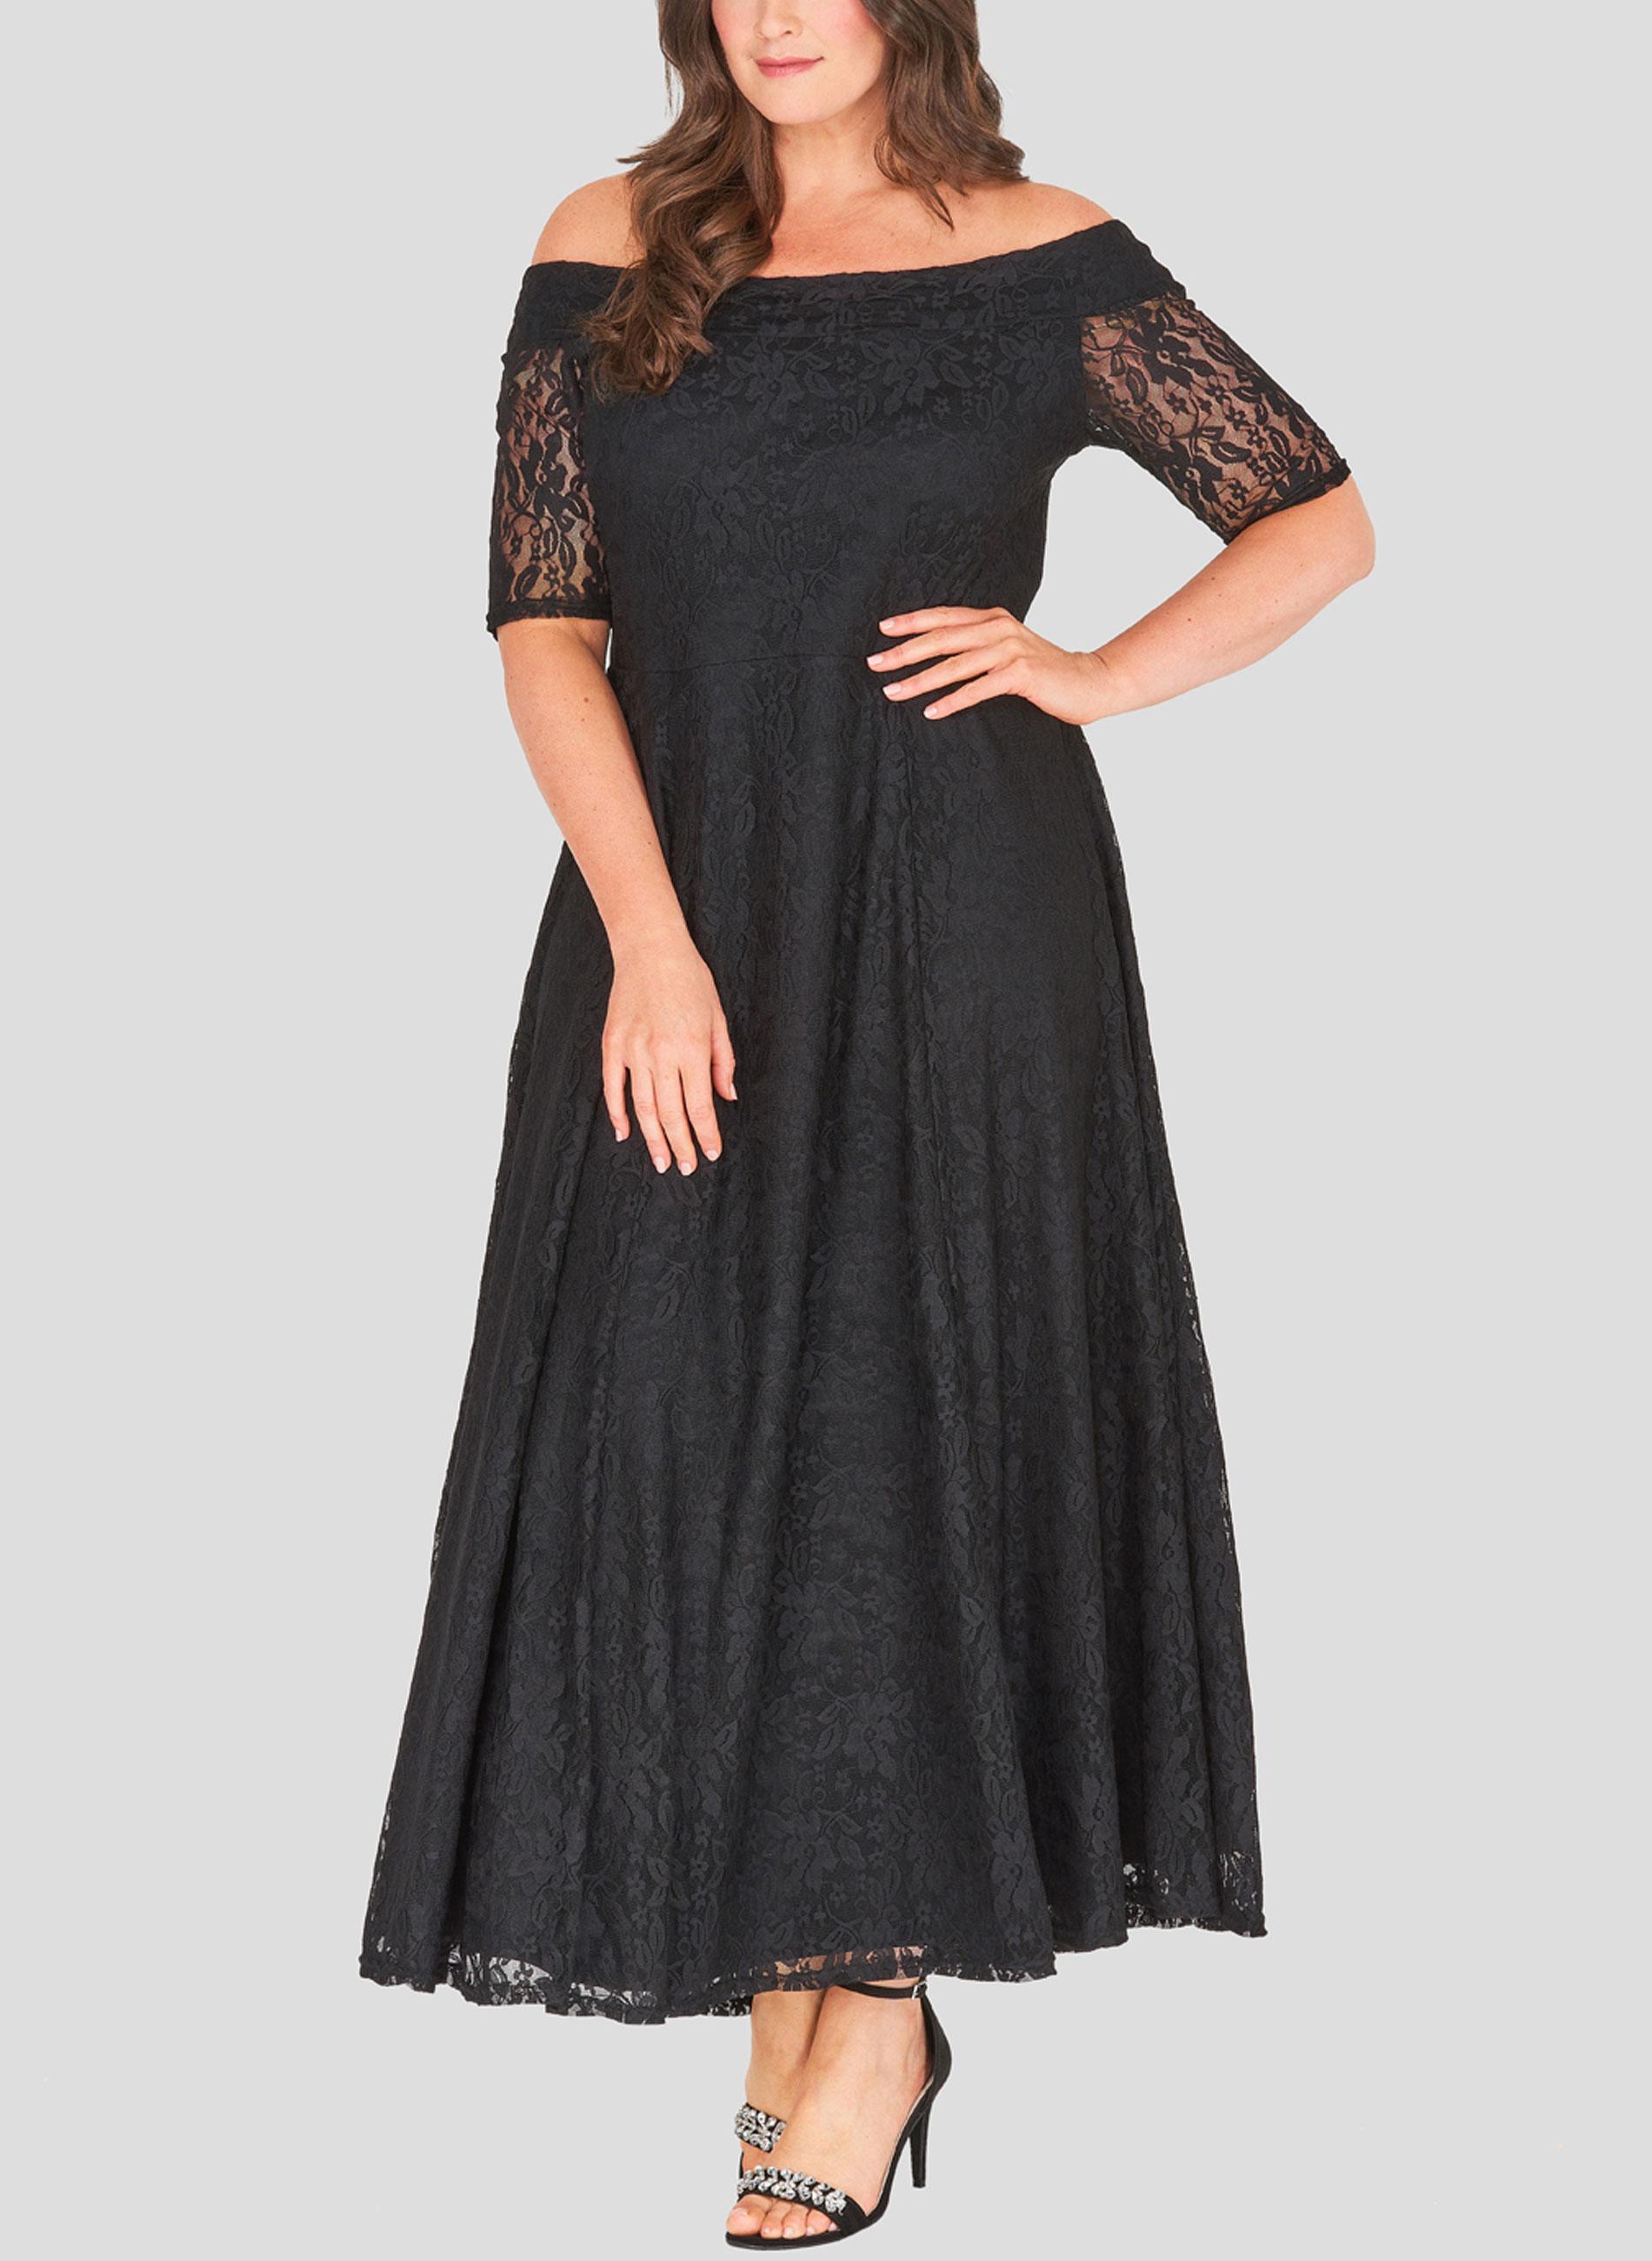 63d9f630b377 ΜΕΓΑΛΑ ΜΕΓΕΘΗ ΦΟΡΕΜΑΤΑ    Φόρεμα Μαύρο Maxi Δαντέλα - Μόδα σε μεγάλα ...